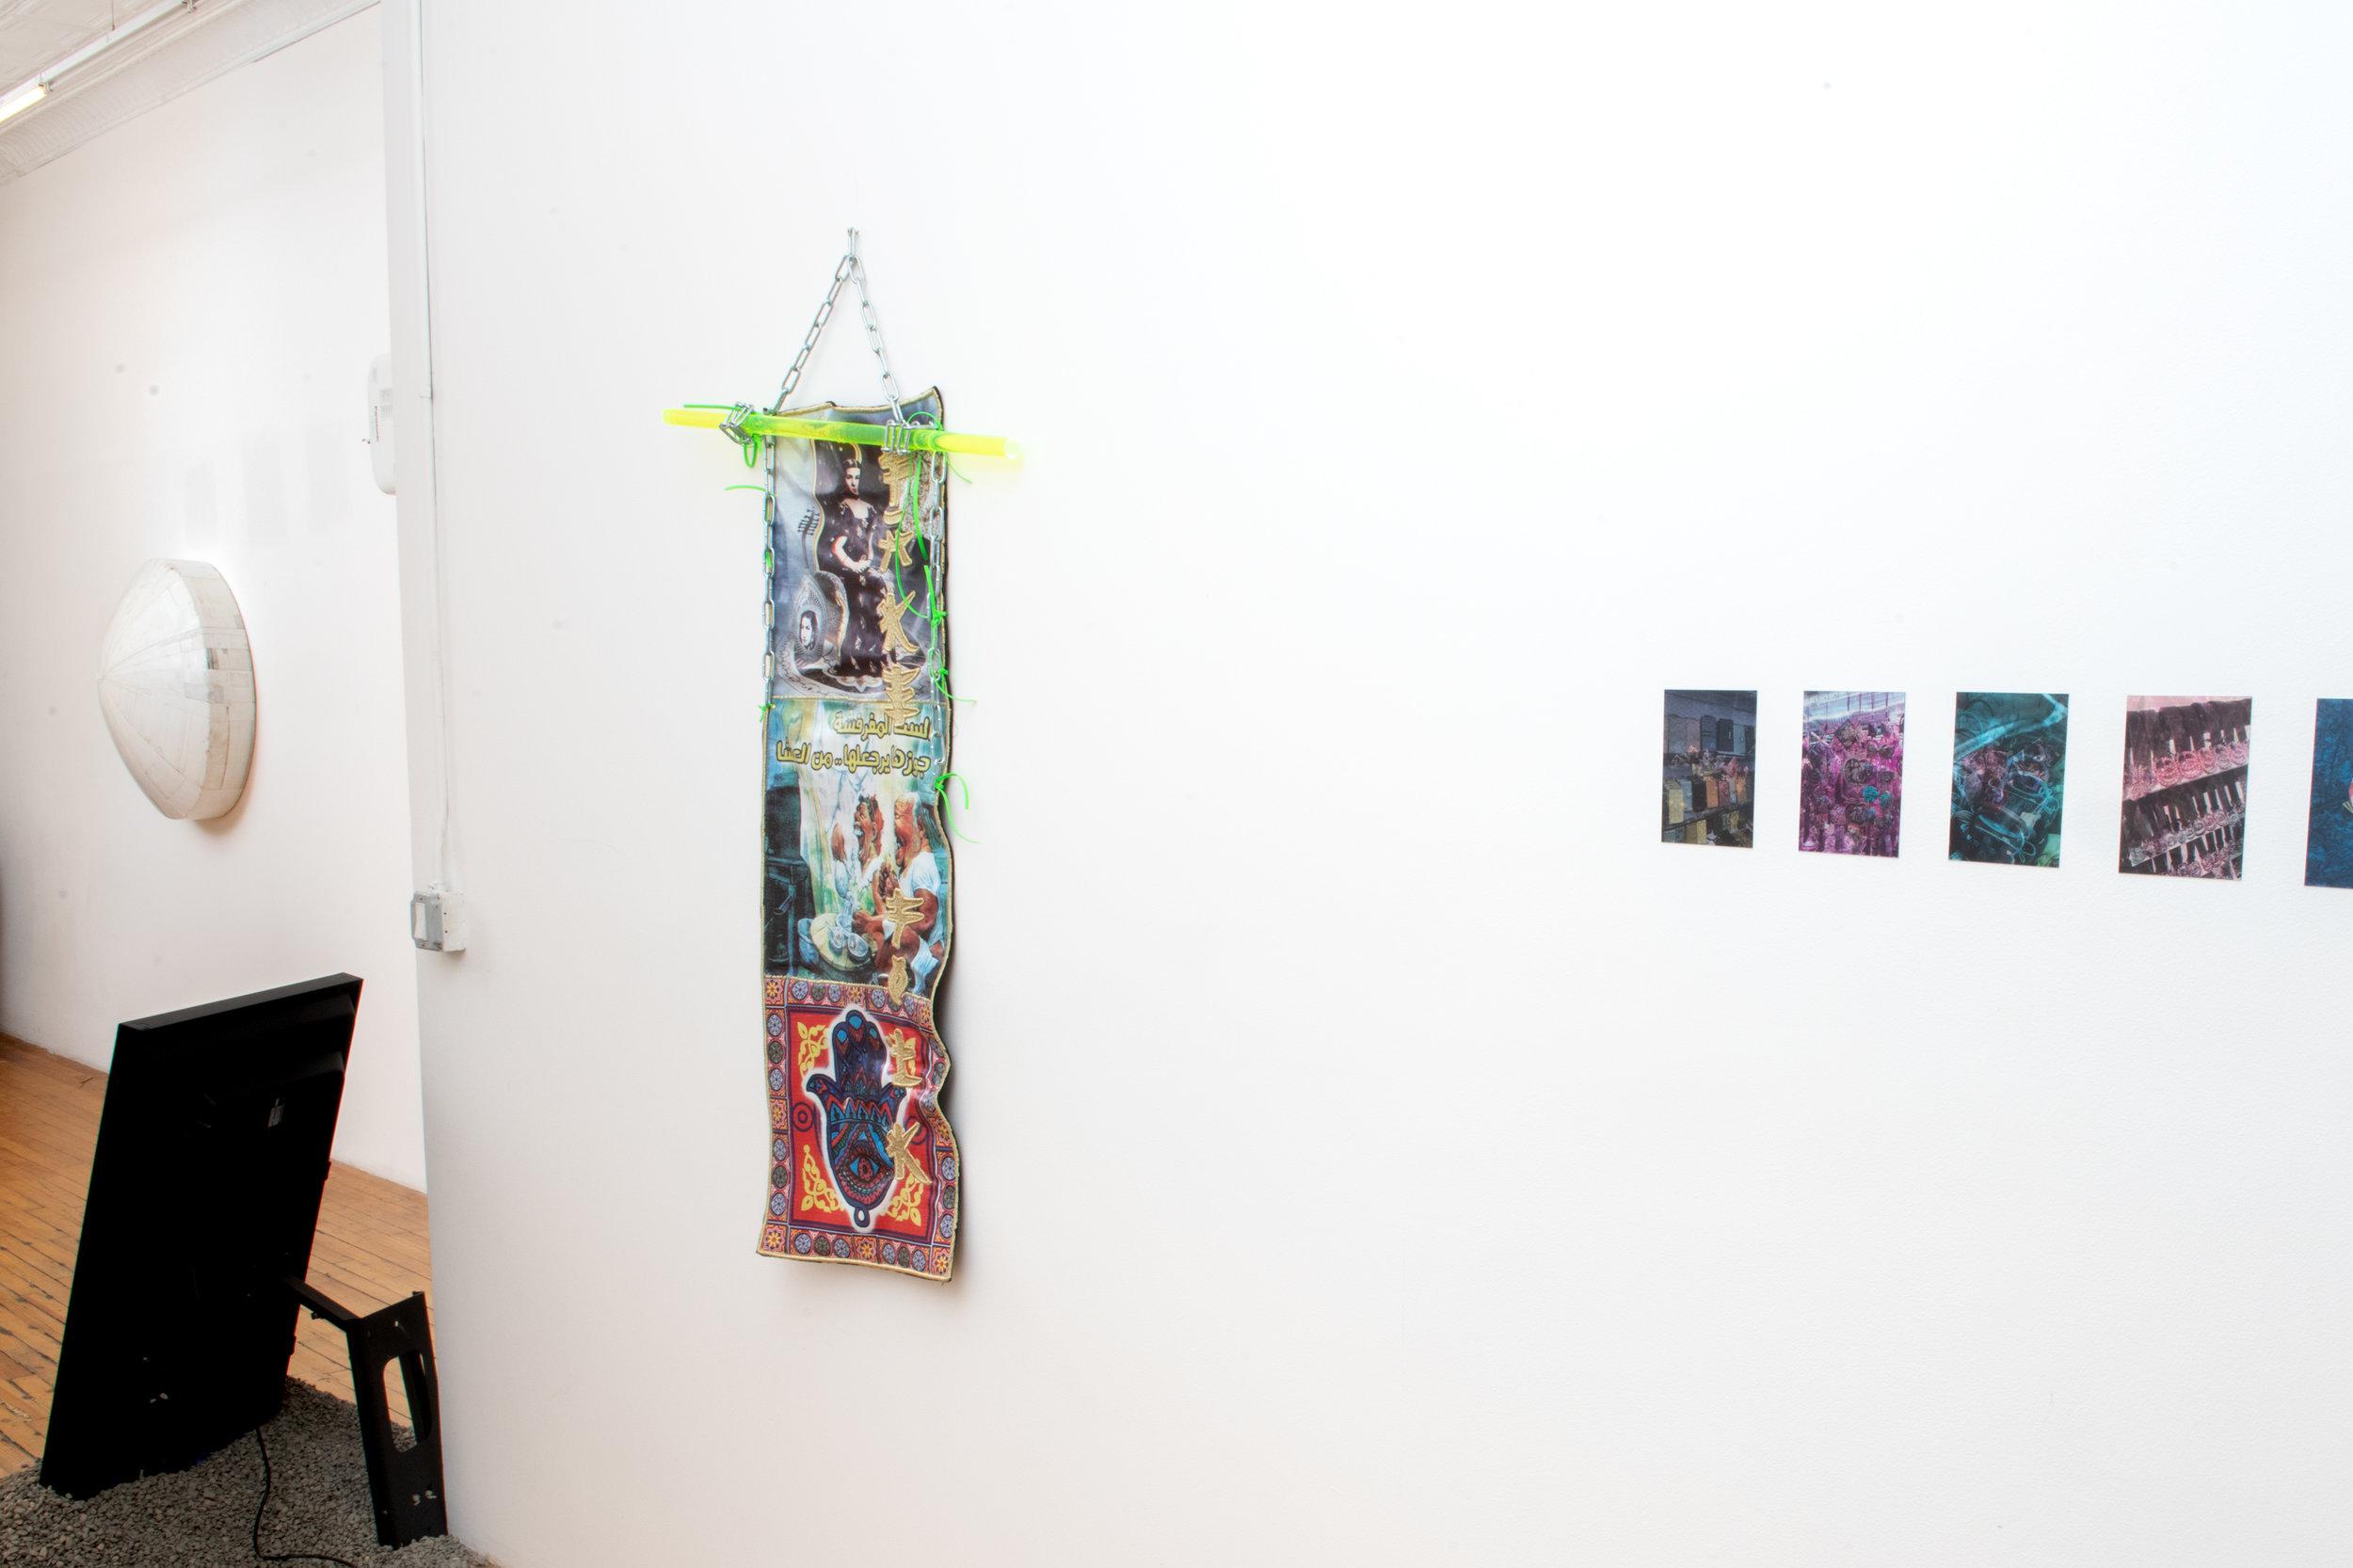 Here + Now Installation view at Pablo's Birthday Focus: Hiroyuki Hamada, Stine Deja, and Anna Ehrenstein Photograph by - Edoardo Cozzani